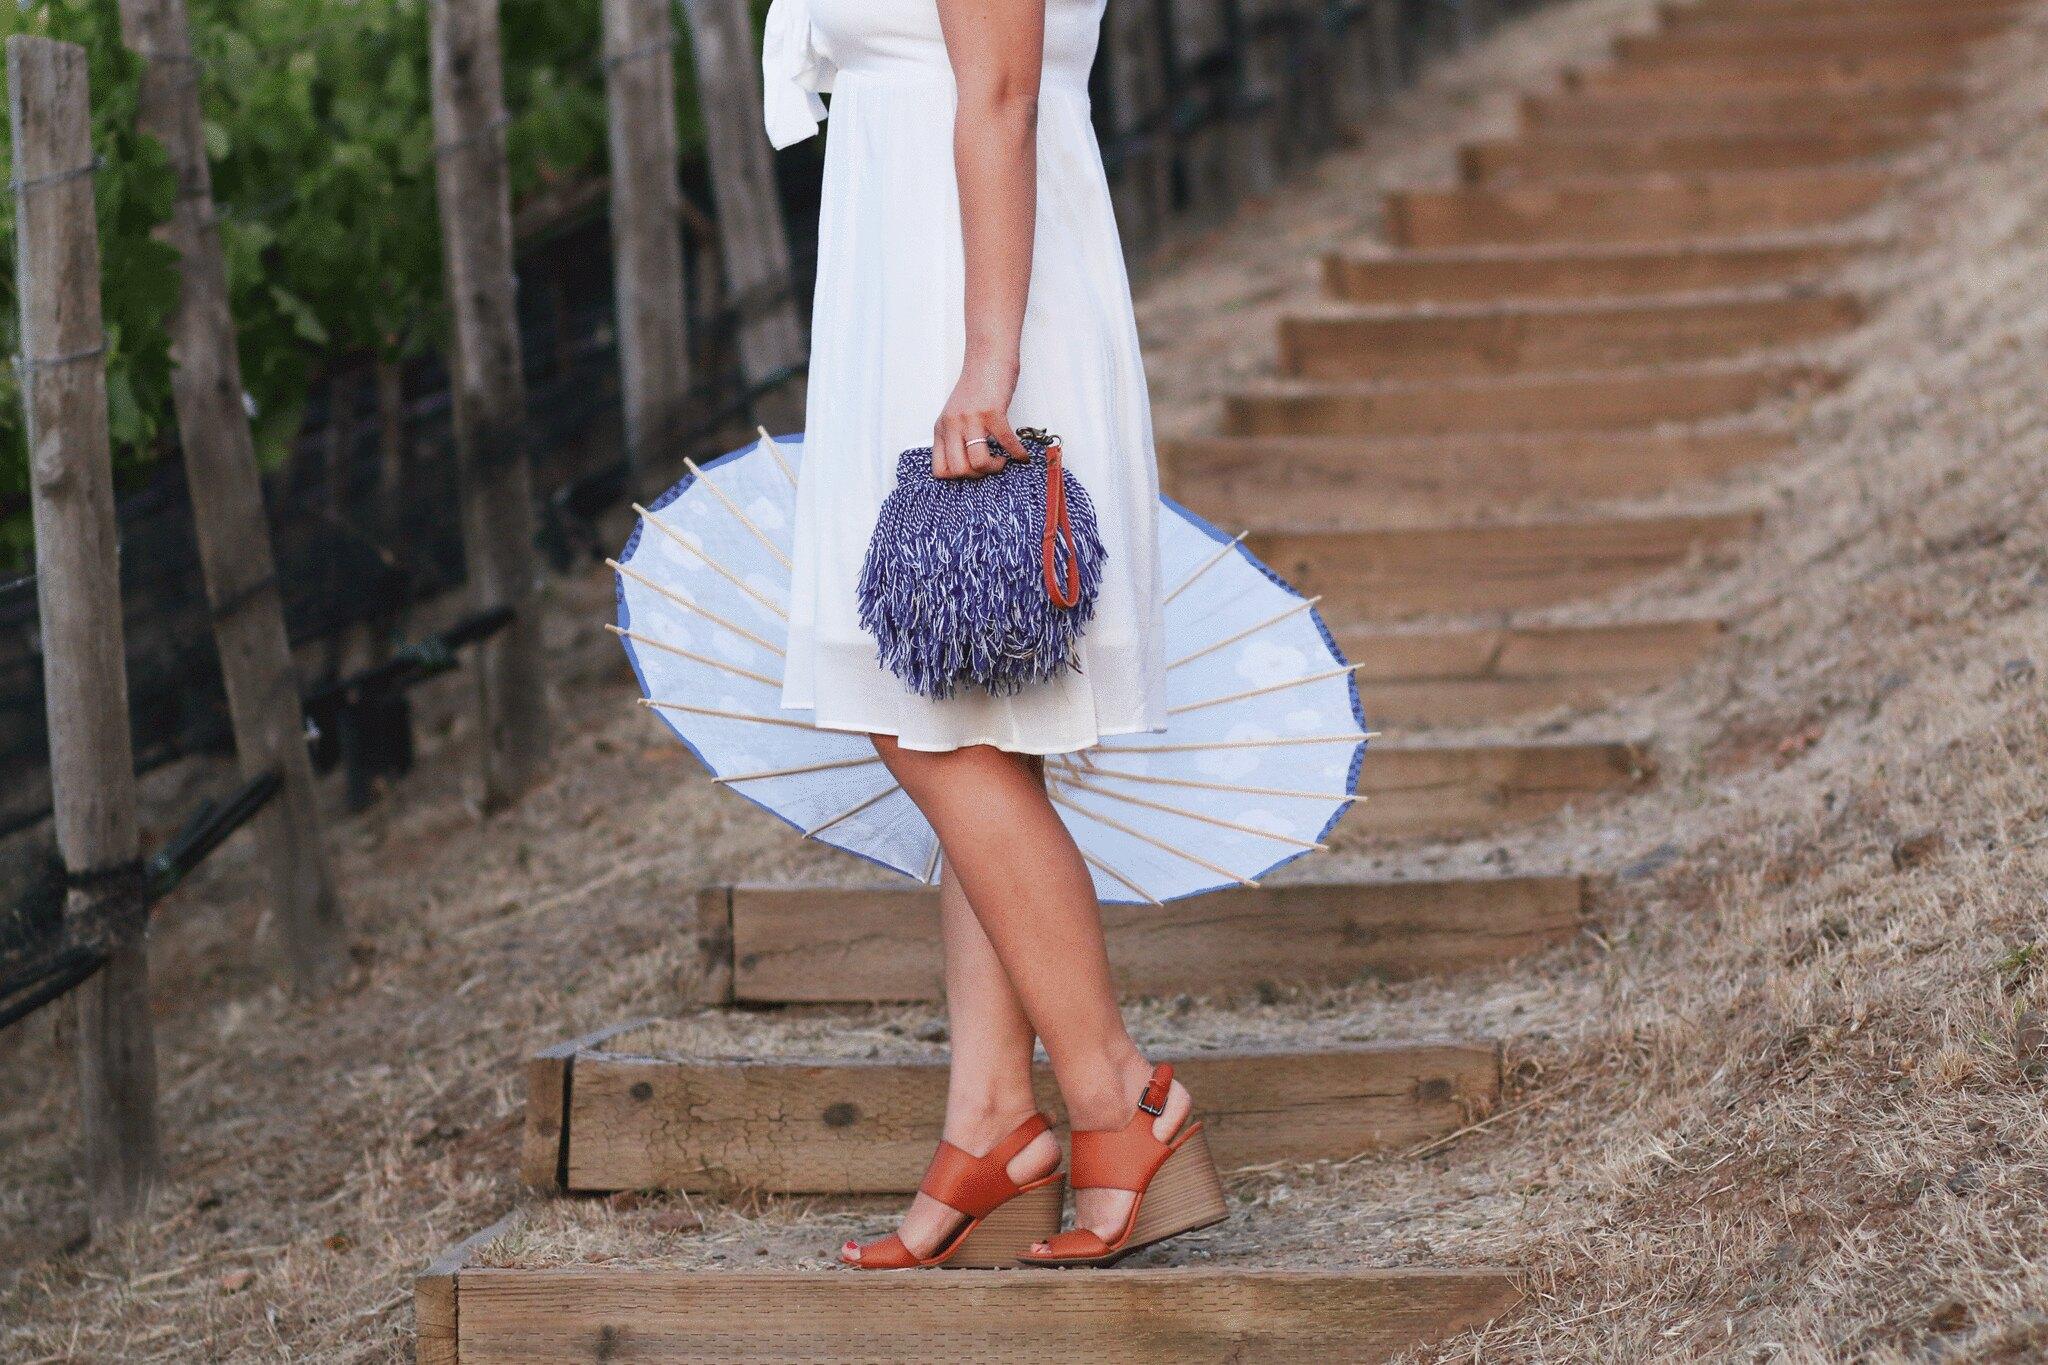 simplyxclassic, miriam gin, nordstrom dress, little white dress, lwd, fashion blogger, napa valley, meritage resort, club monaco, where to stay in napa